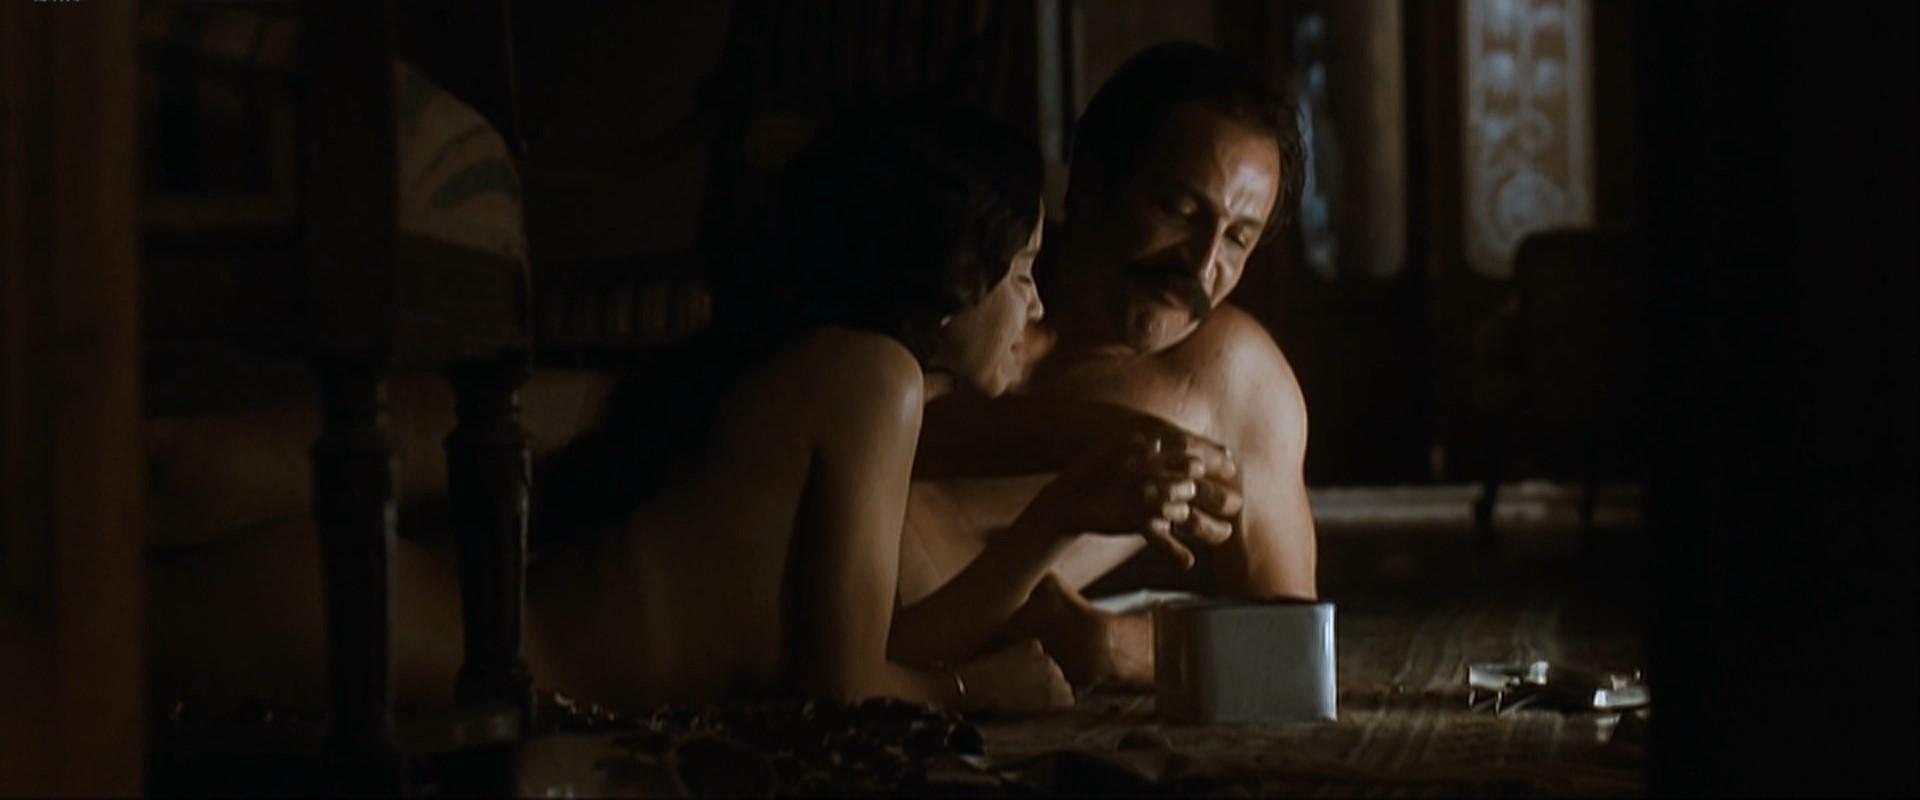 Ana Claudia Talancon Sex Scene watch online - ana claudia talancon – arrancame la vida